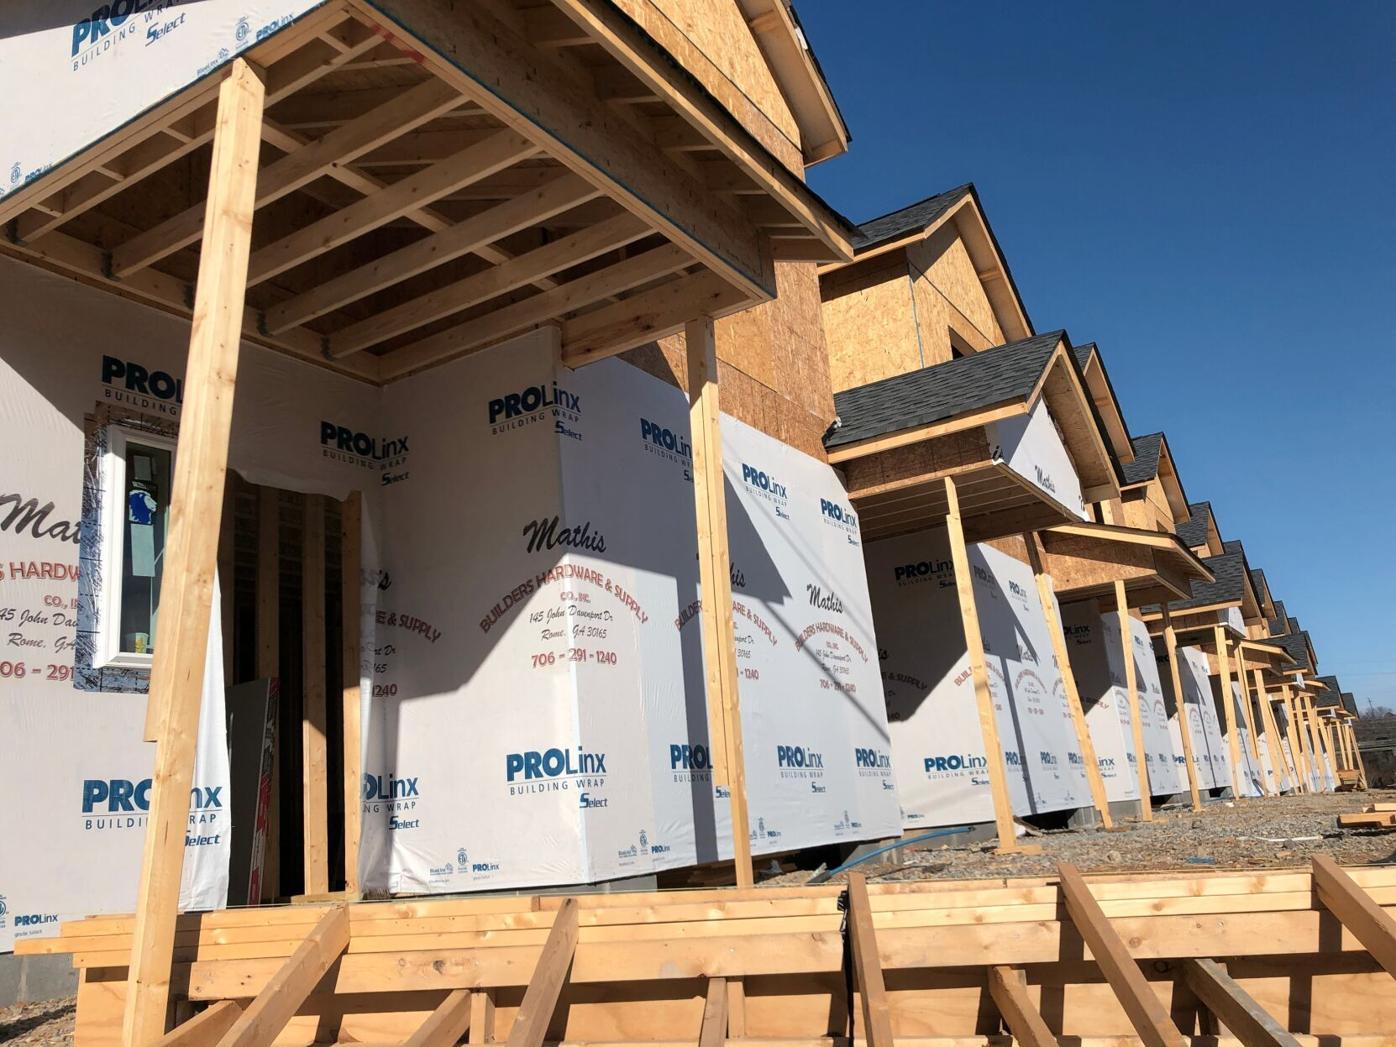 Floyd County housing market needs a boost, mayor says